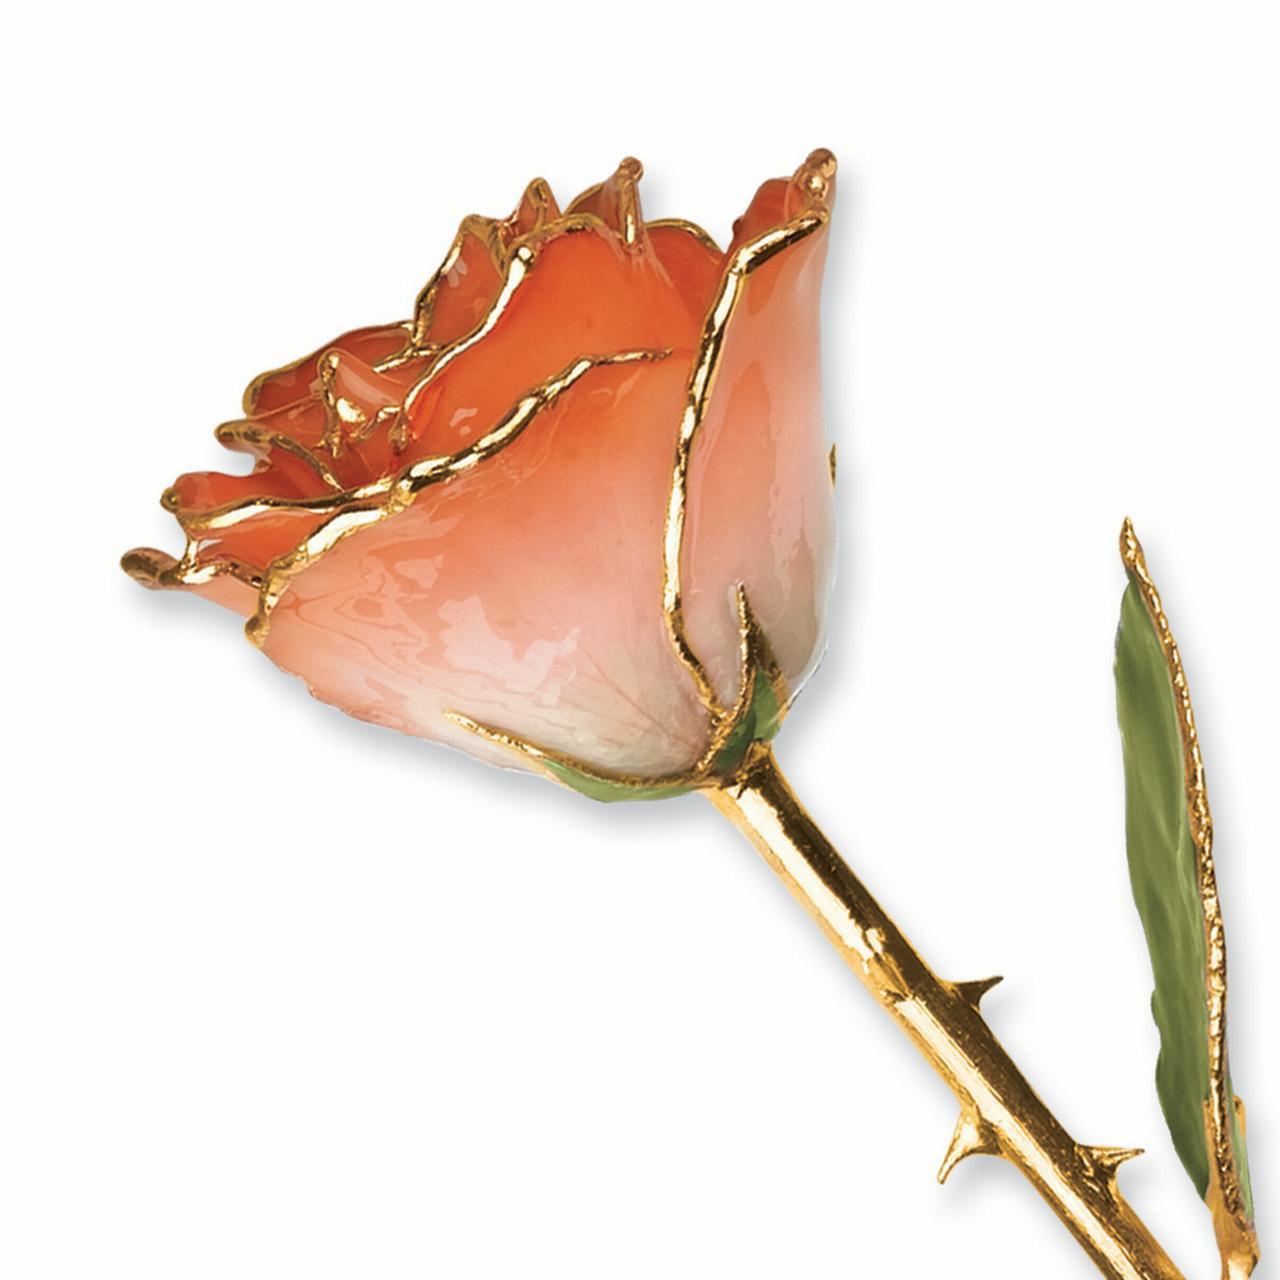 Lacquer Dipped Gold Trim White Orange Rose Figurine Orchid Leaf K Trimmed Keepsake Floral Home Decor Flower For Women